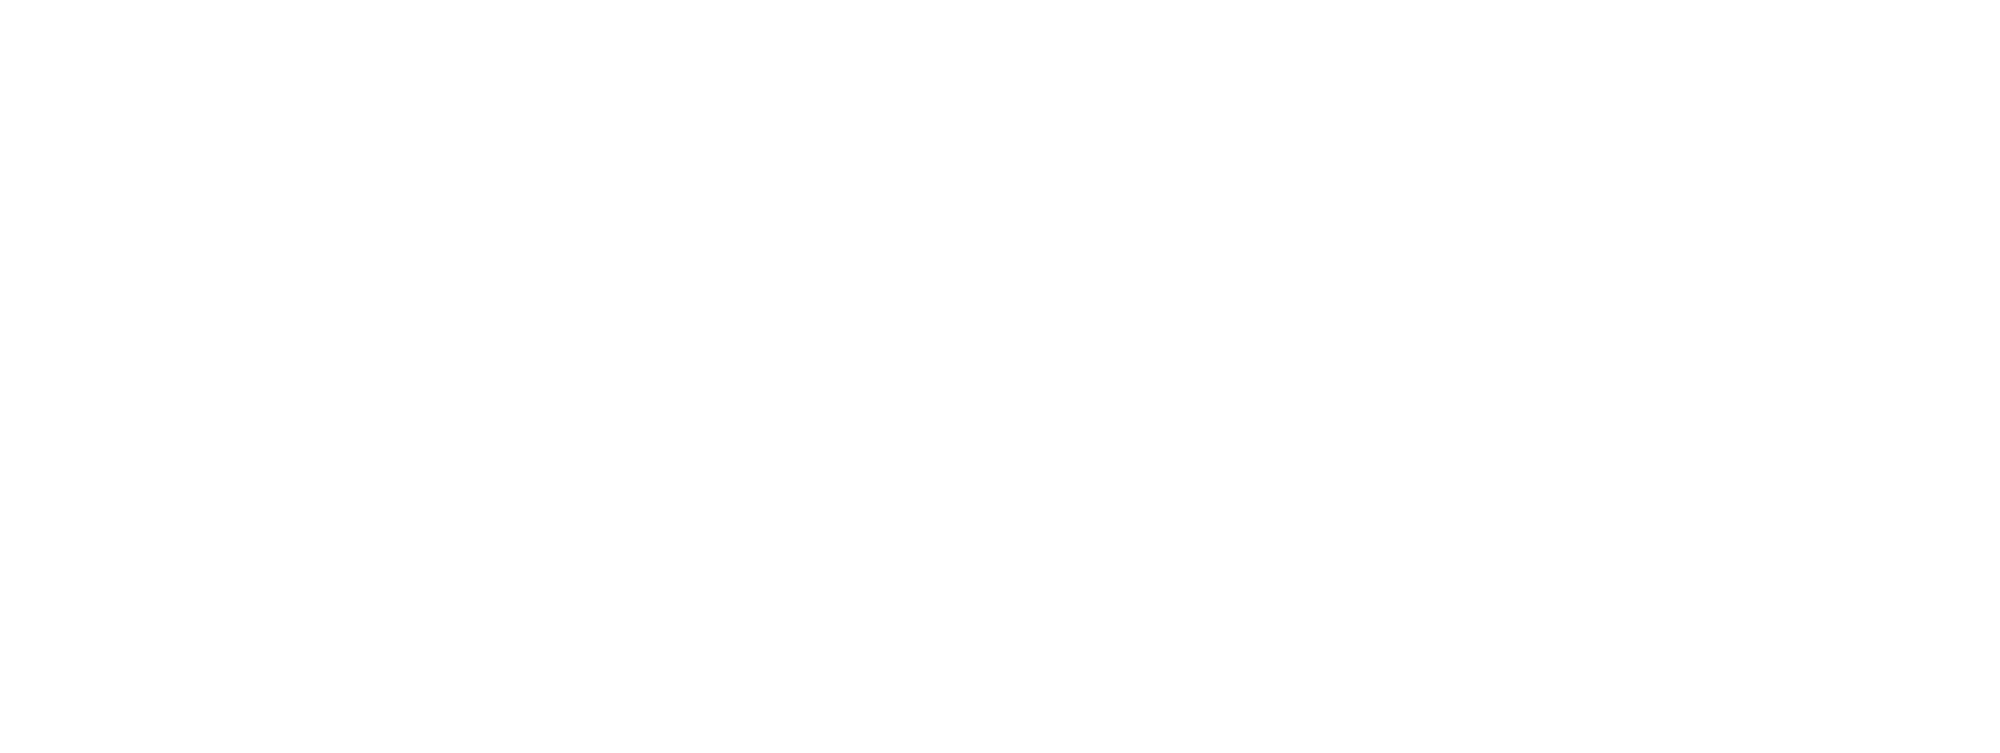 HUB CITY RECORDING-logo-white.png